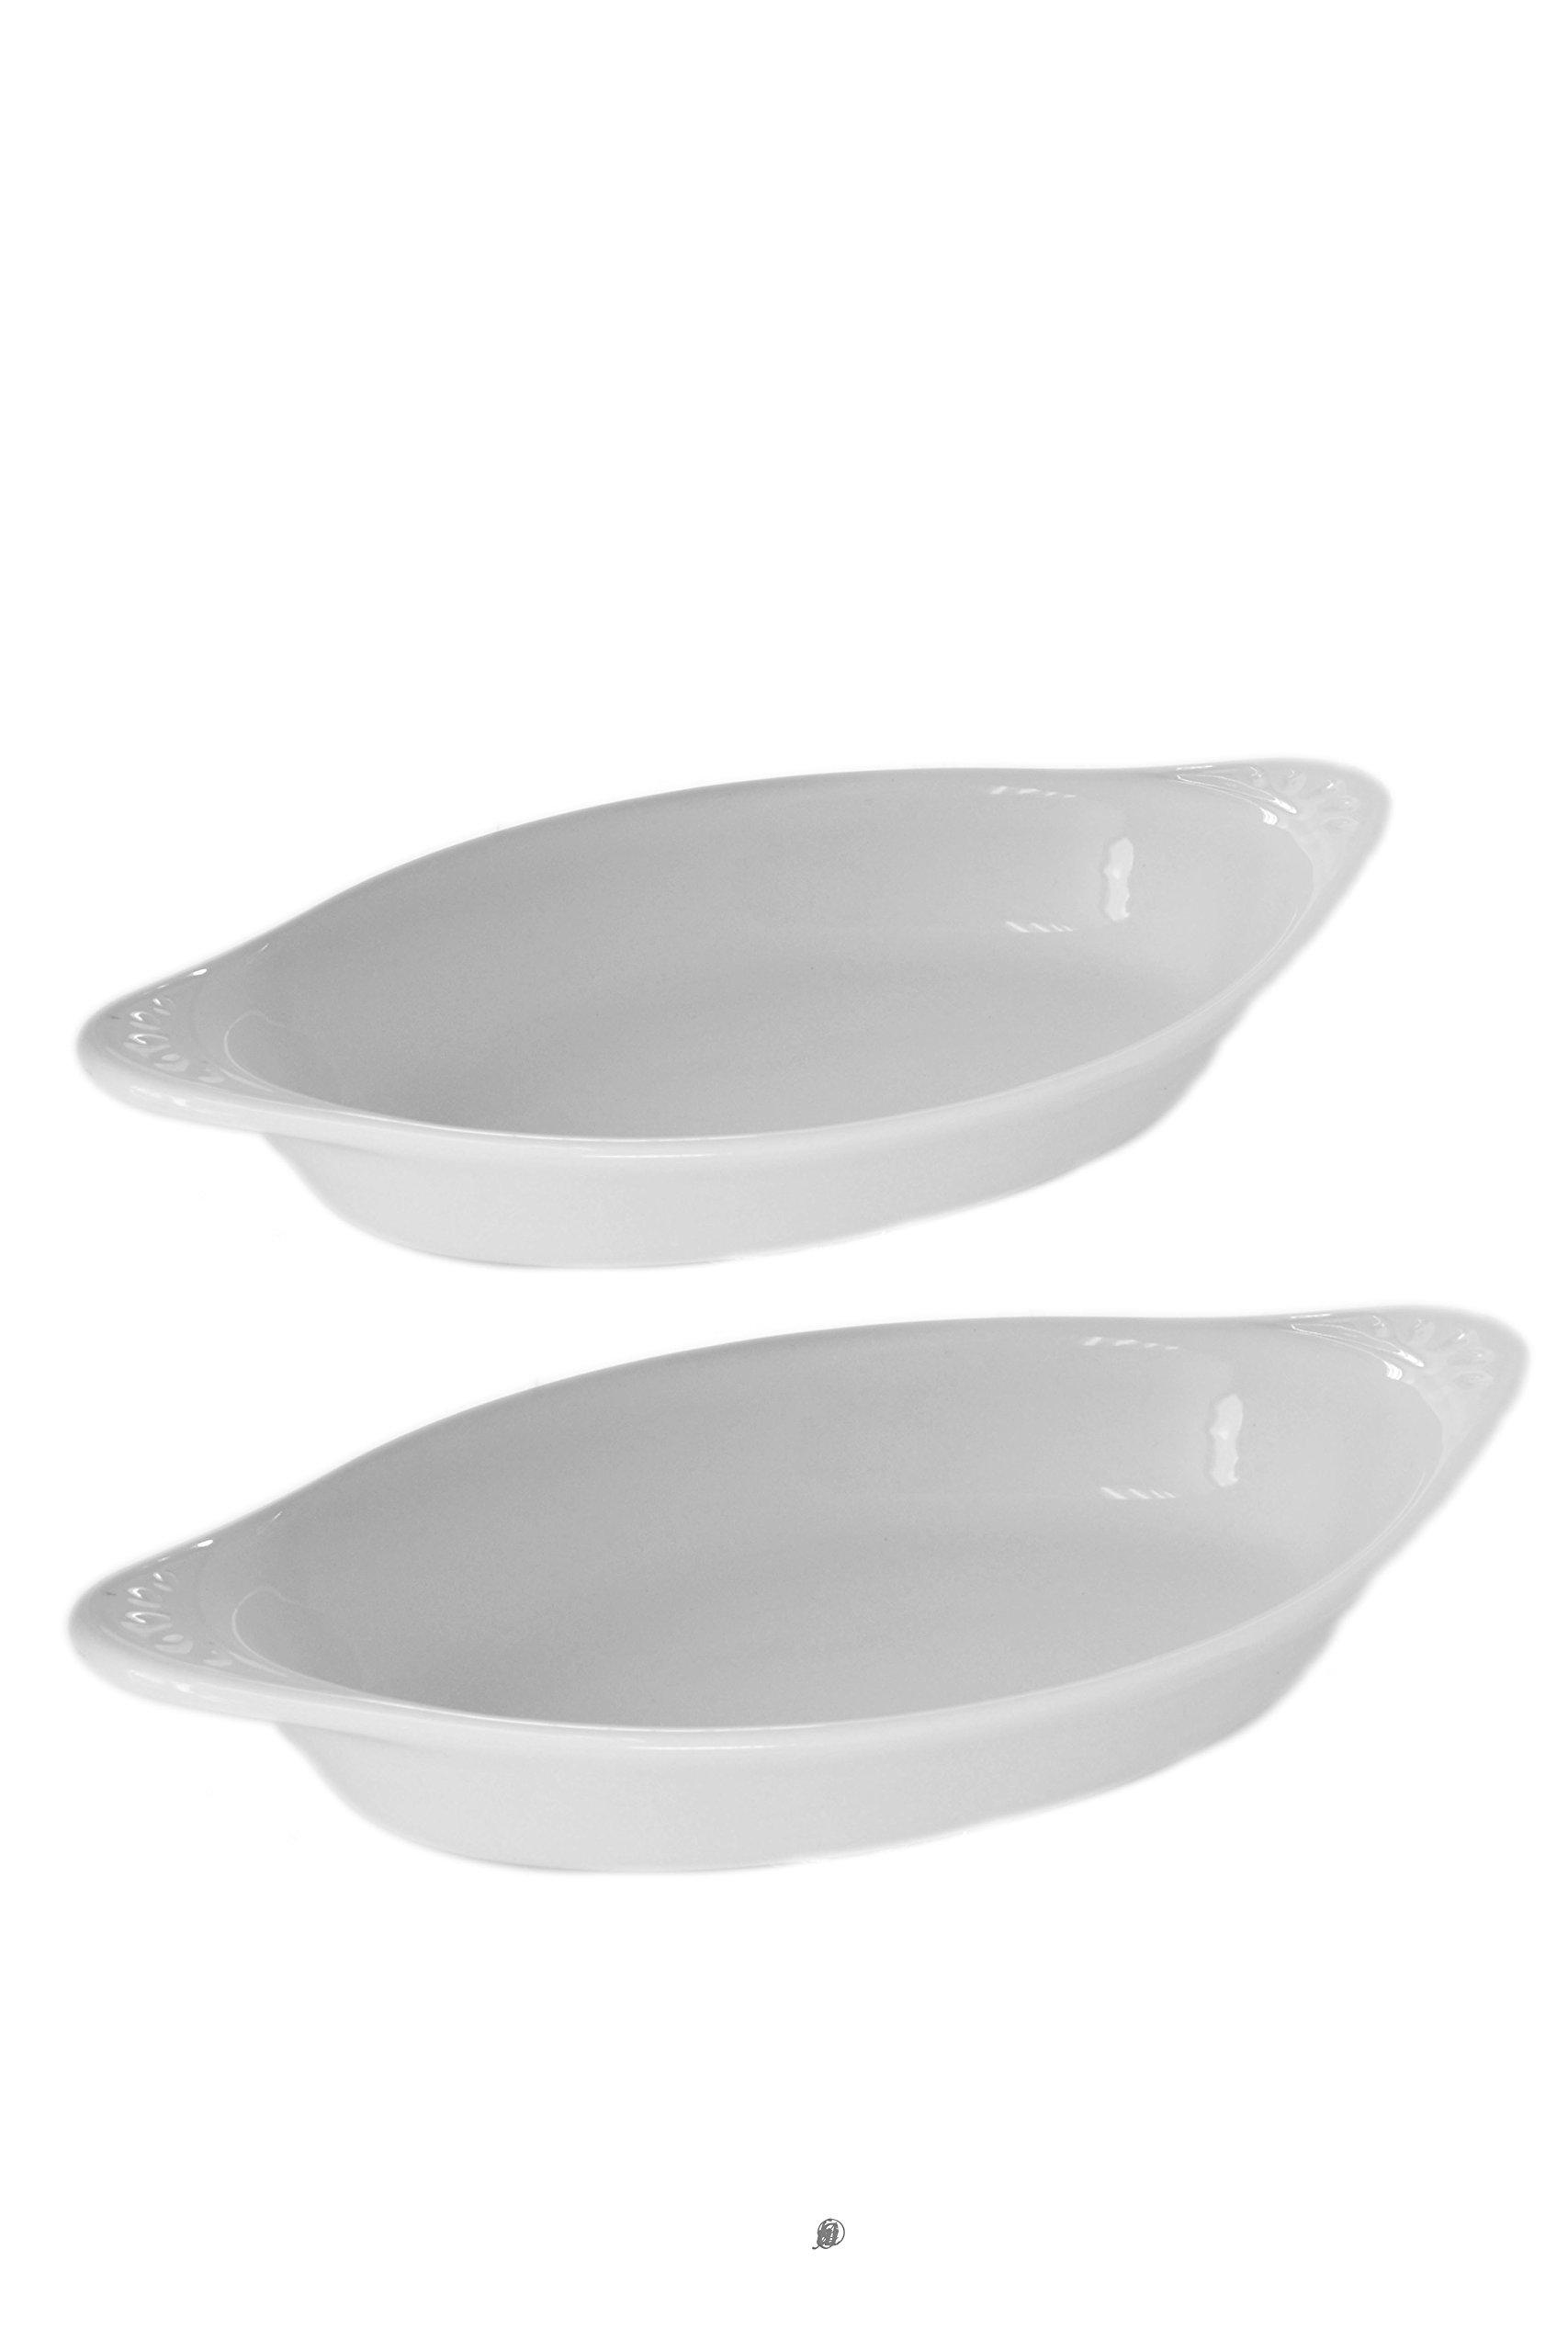 Set of 4 White Portuguese Porcelain Au Gratin Dishes with Handles